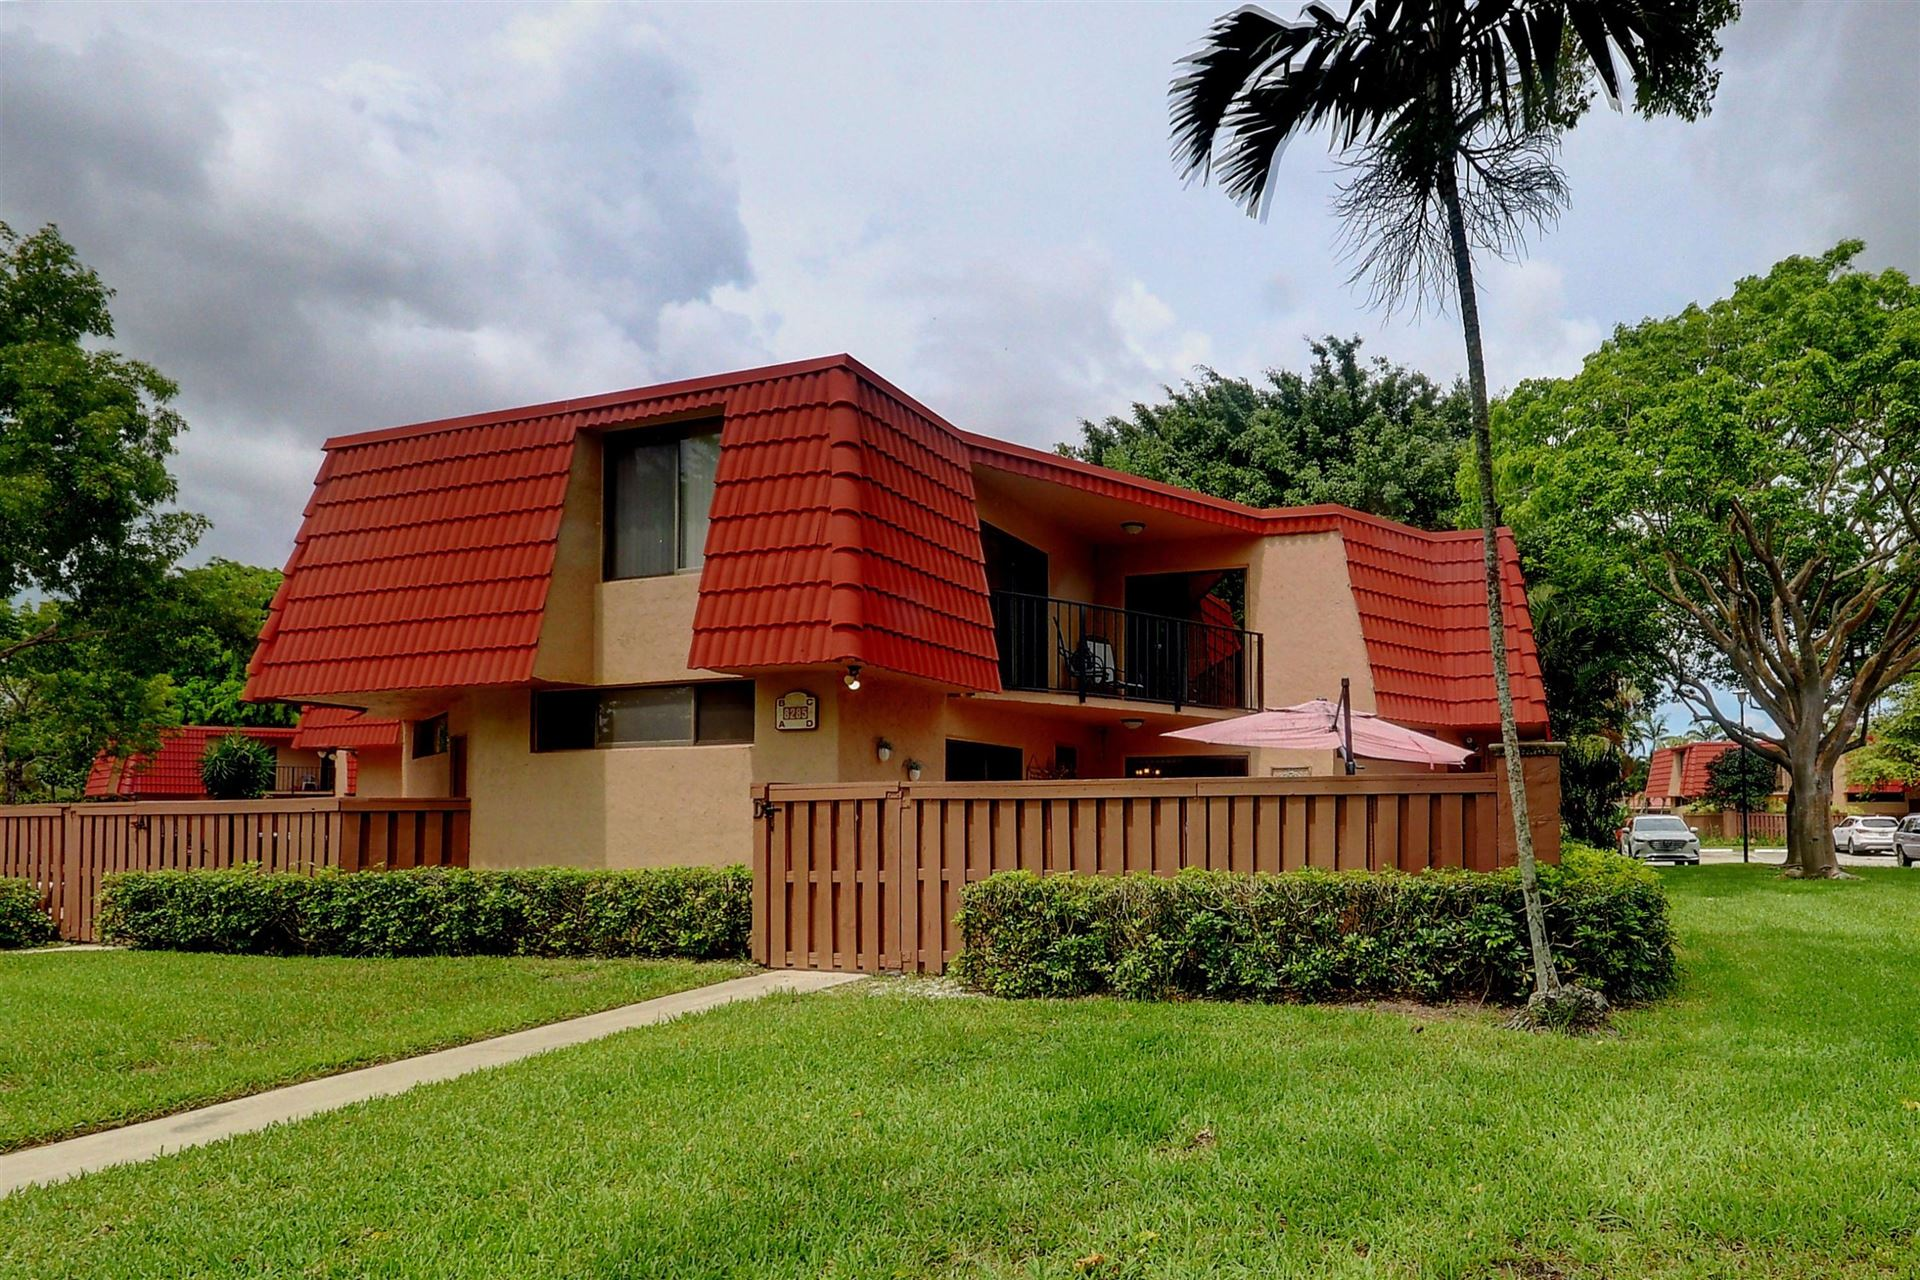 8285 Severn Drive #D, Boca Raton, FL 33433 - #: RX-10632769